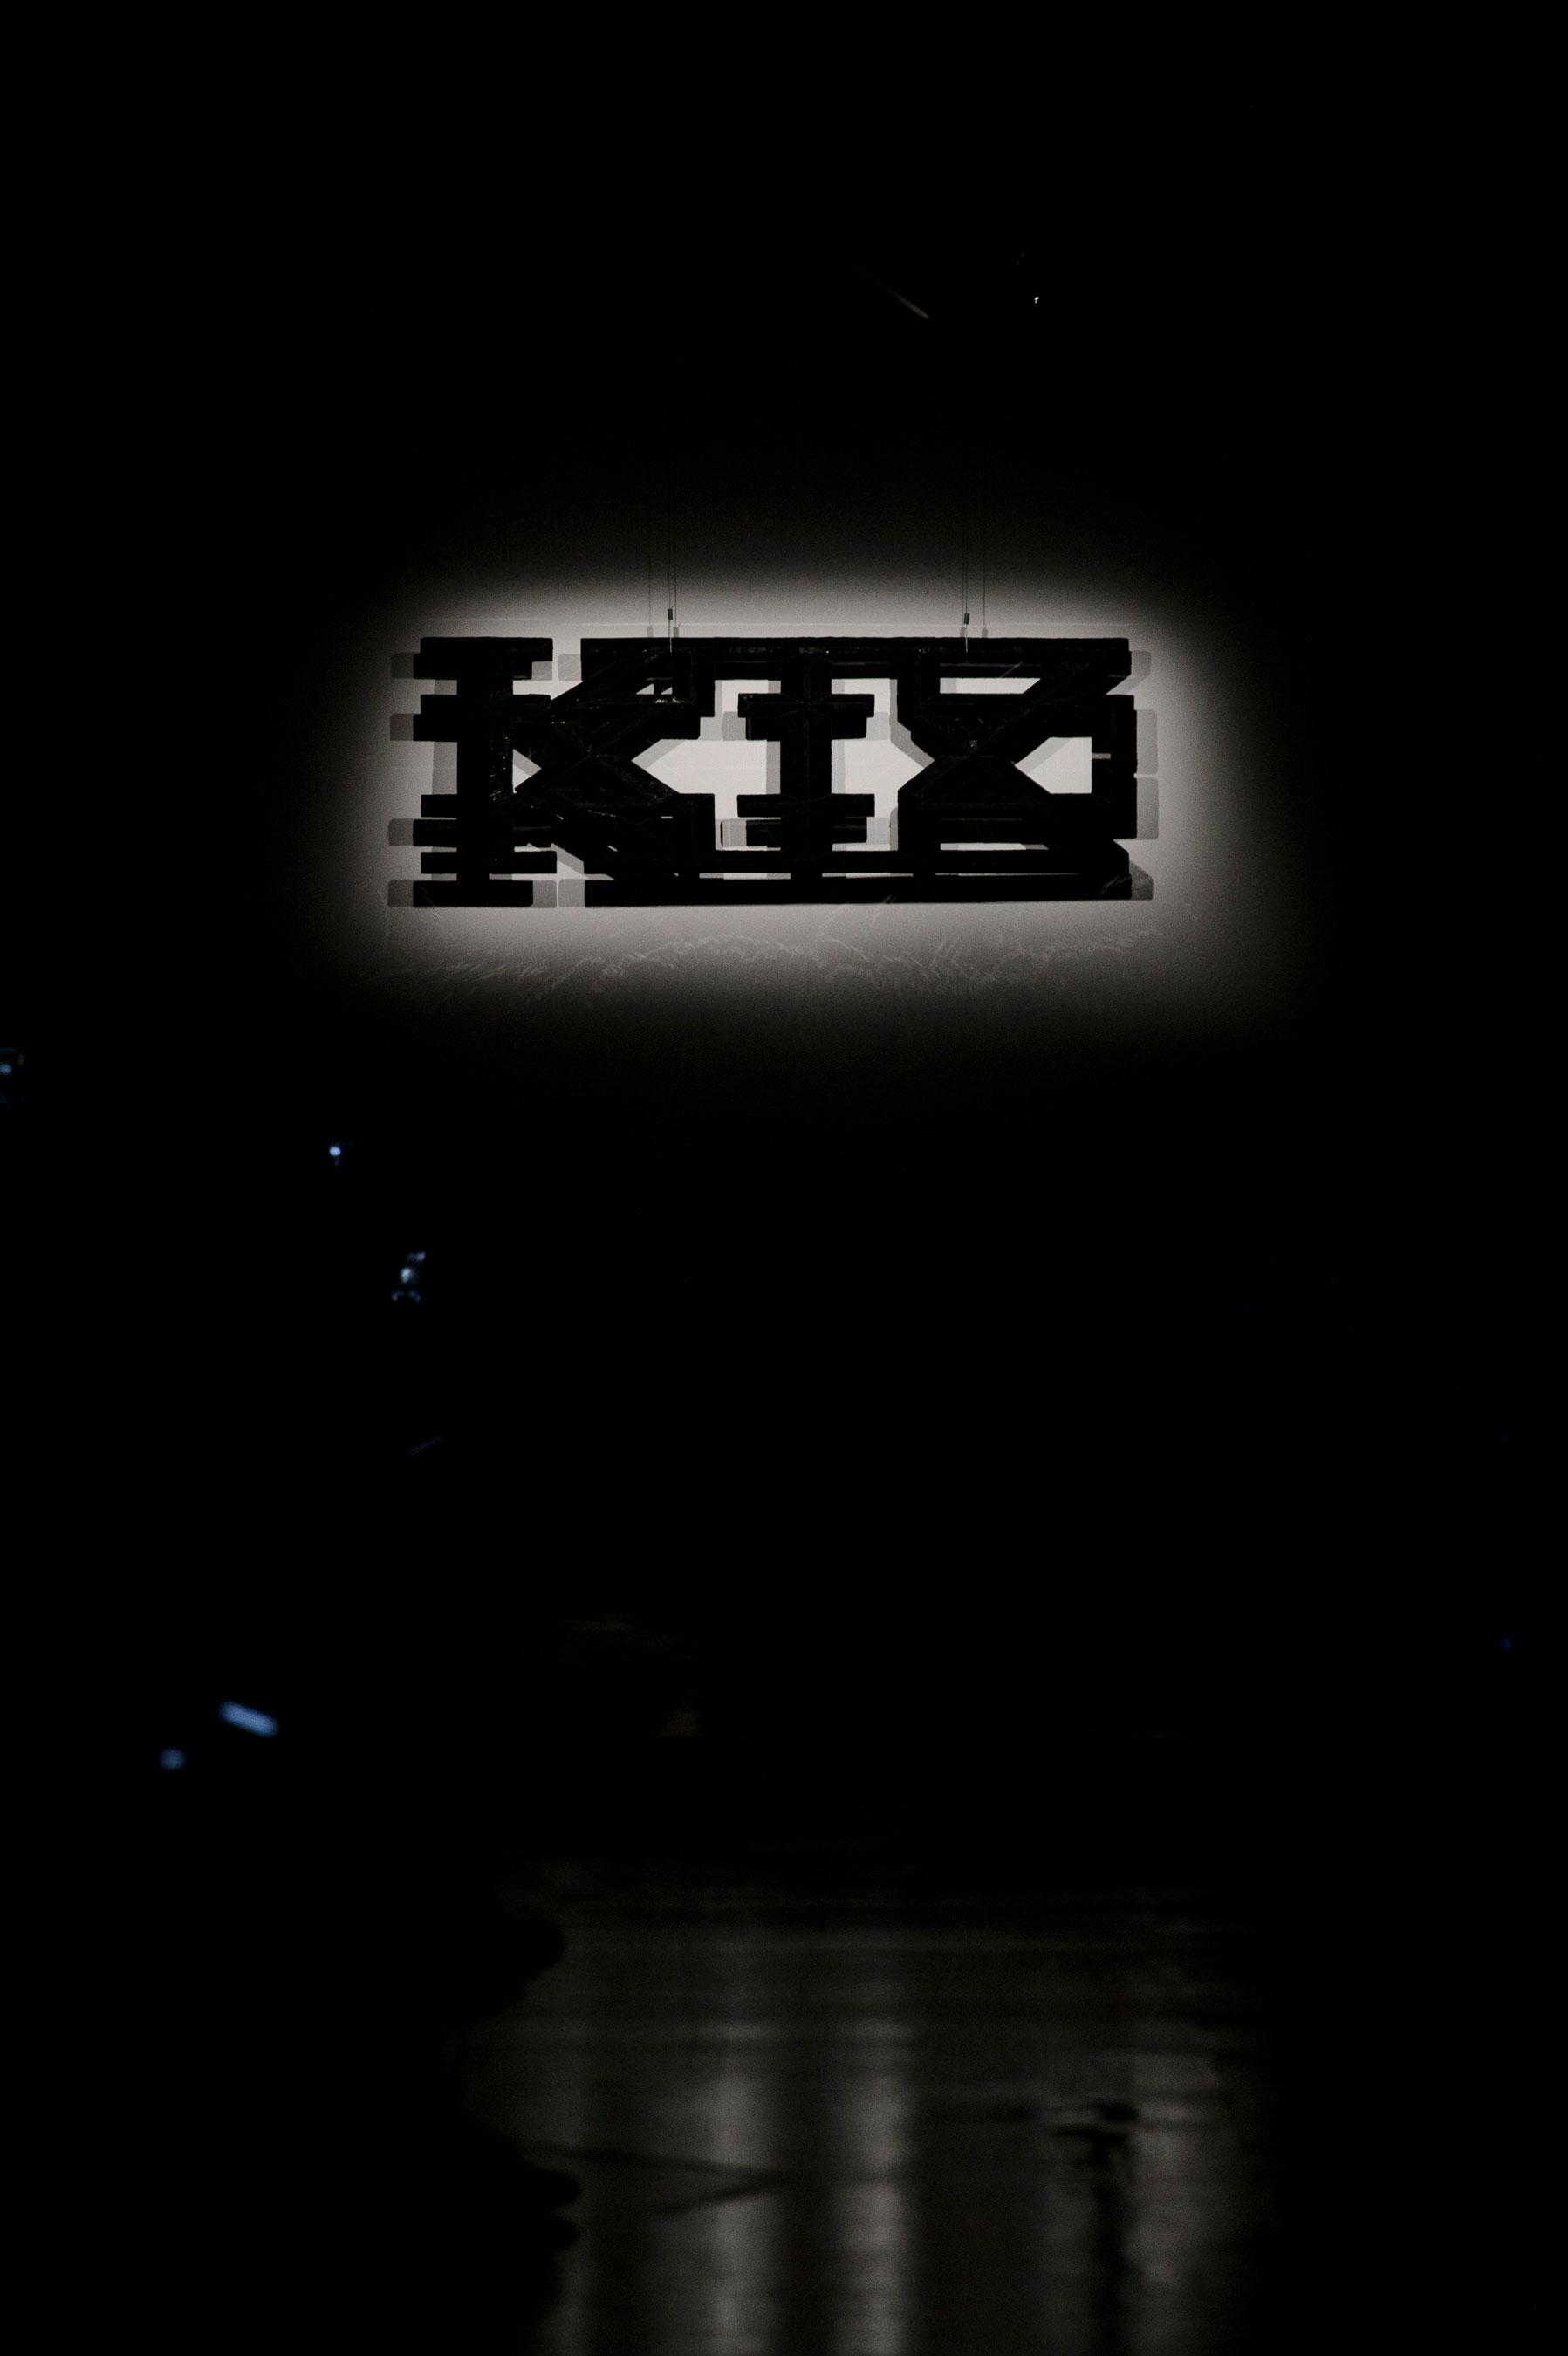 KTZ m RF17 8009